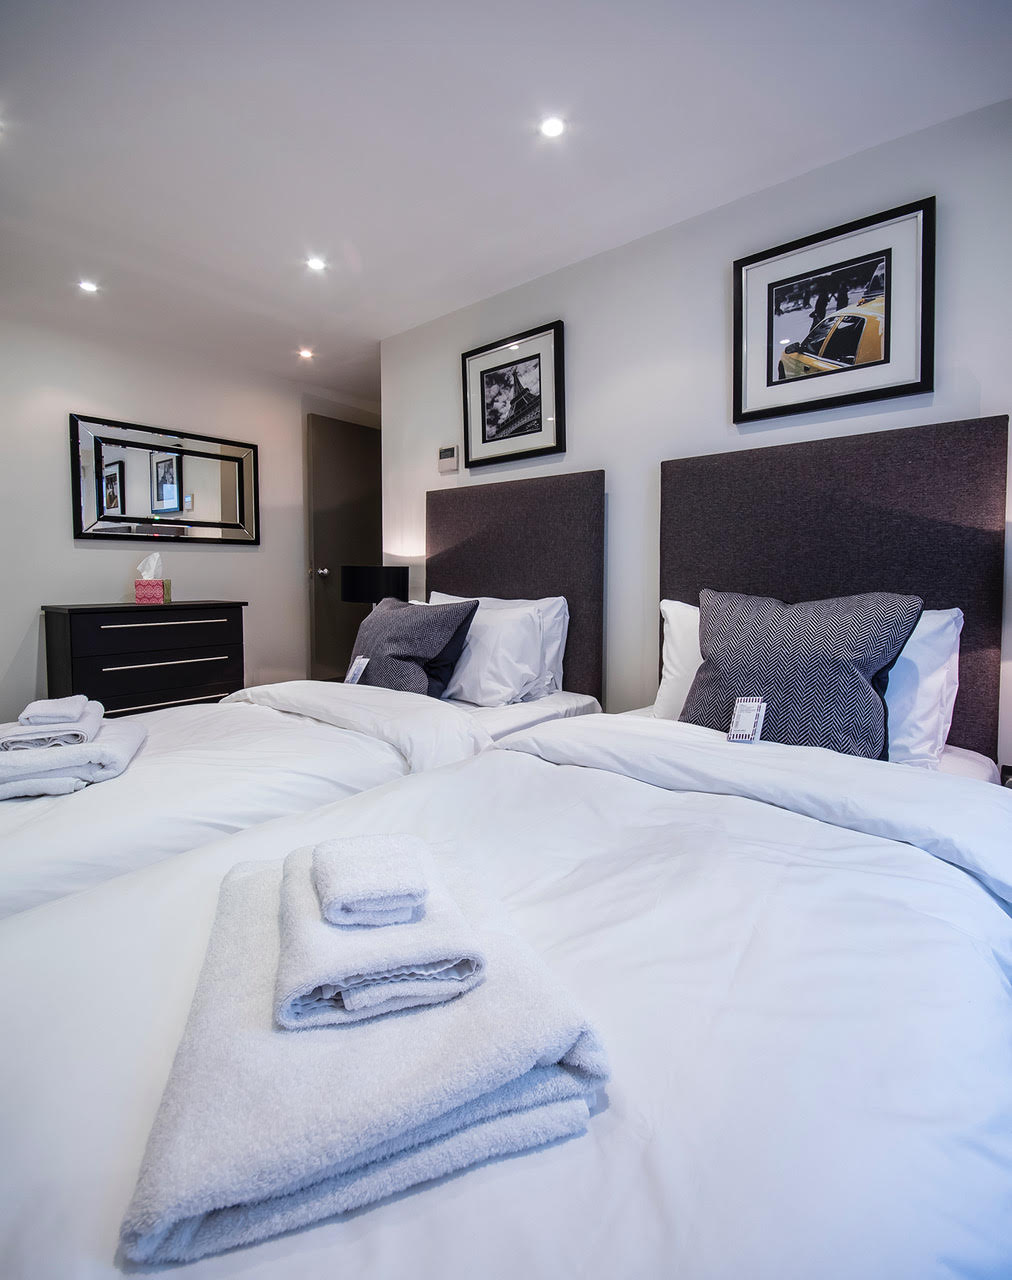 Mayfair 3 Bedroom Fabulous Luxury Suite photo 13827848